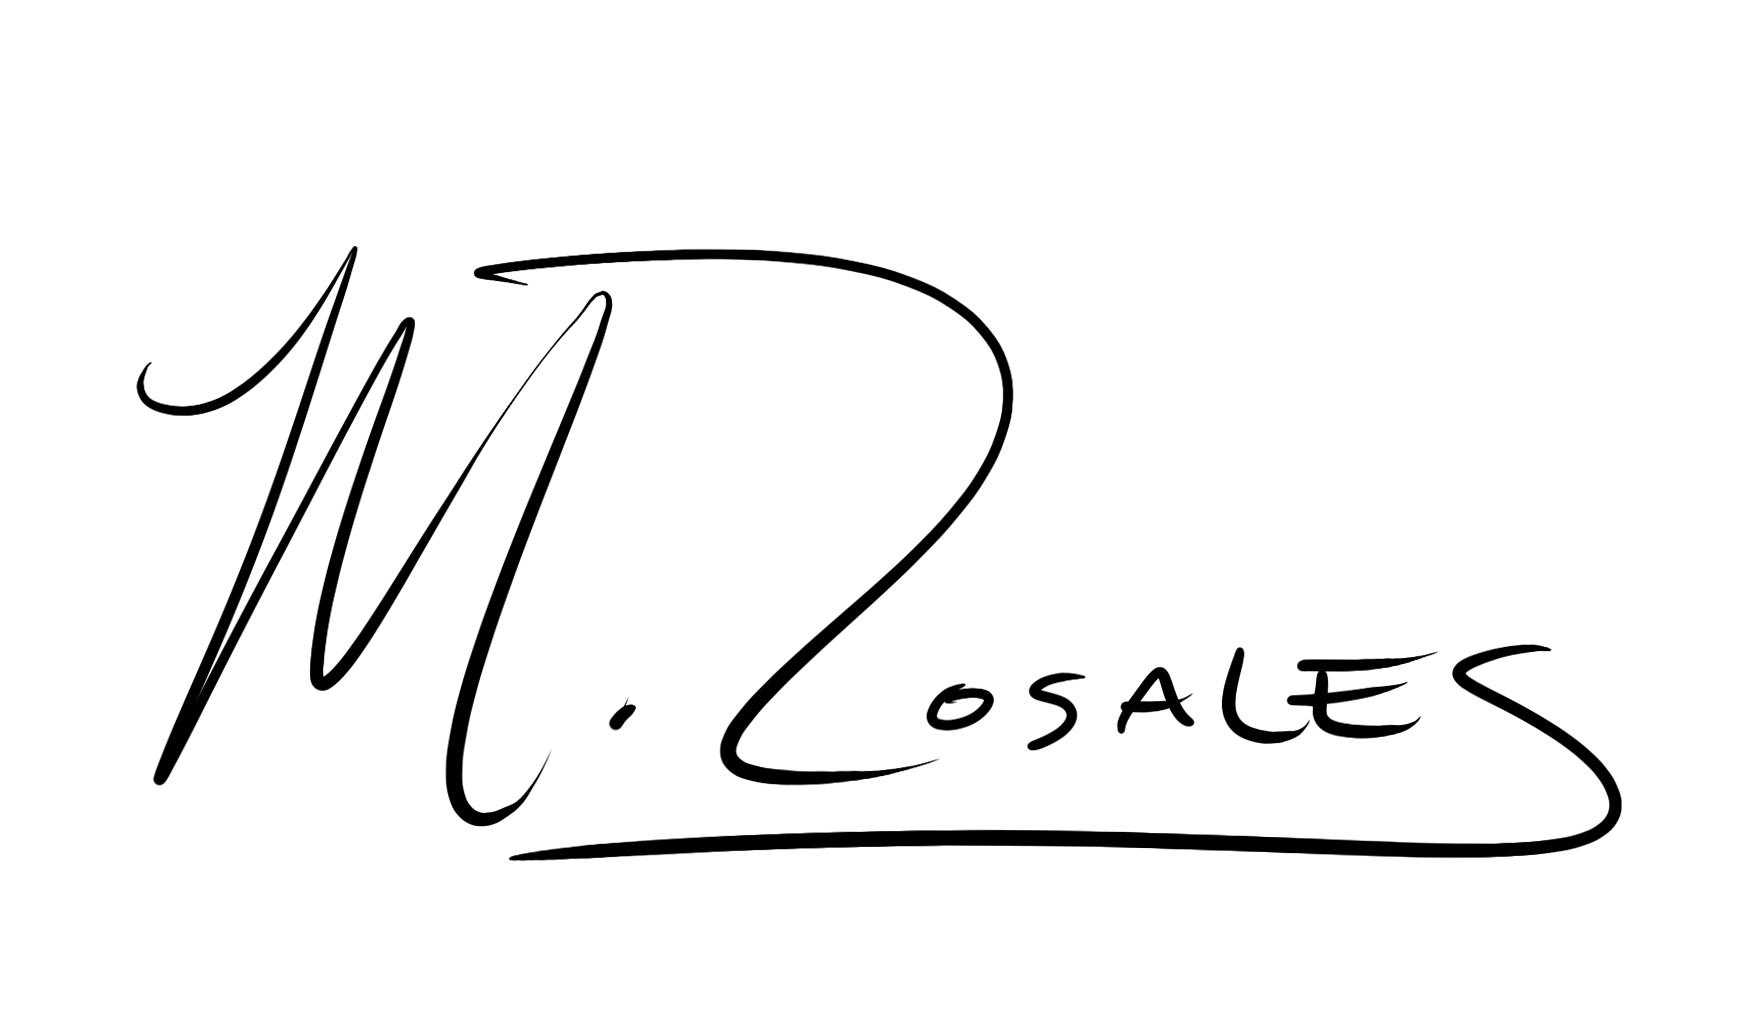 Maya Rosales Signature